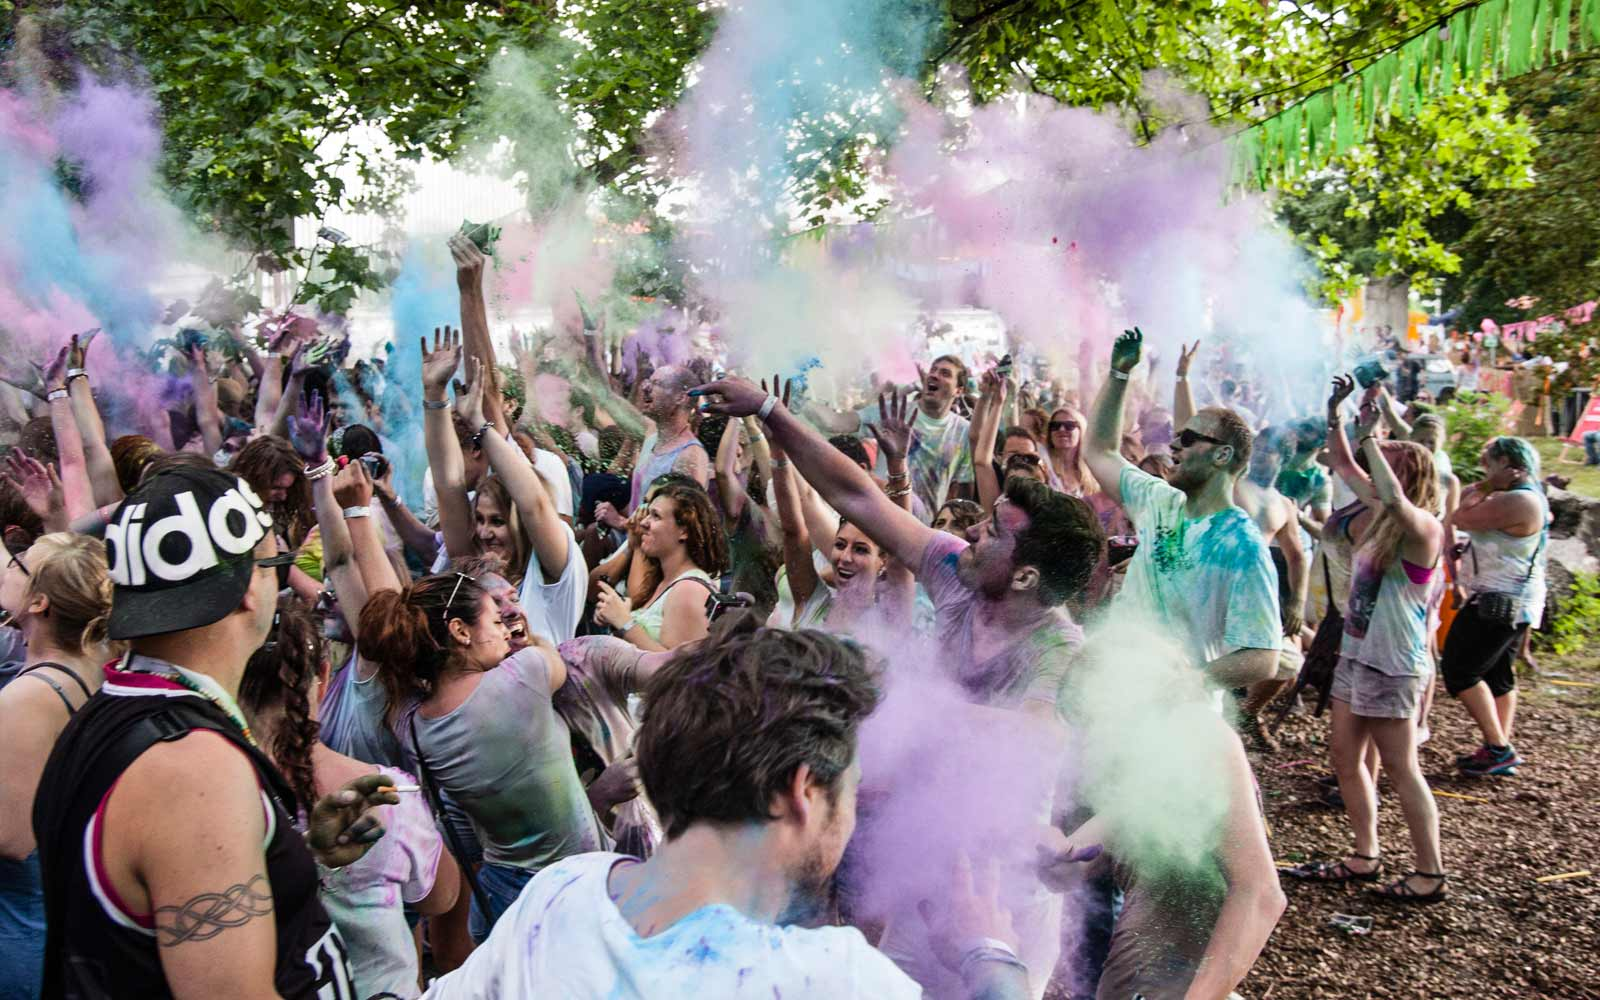 Farbschlacht beim Holi Colors Festival